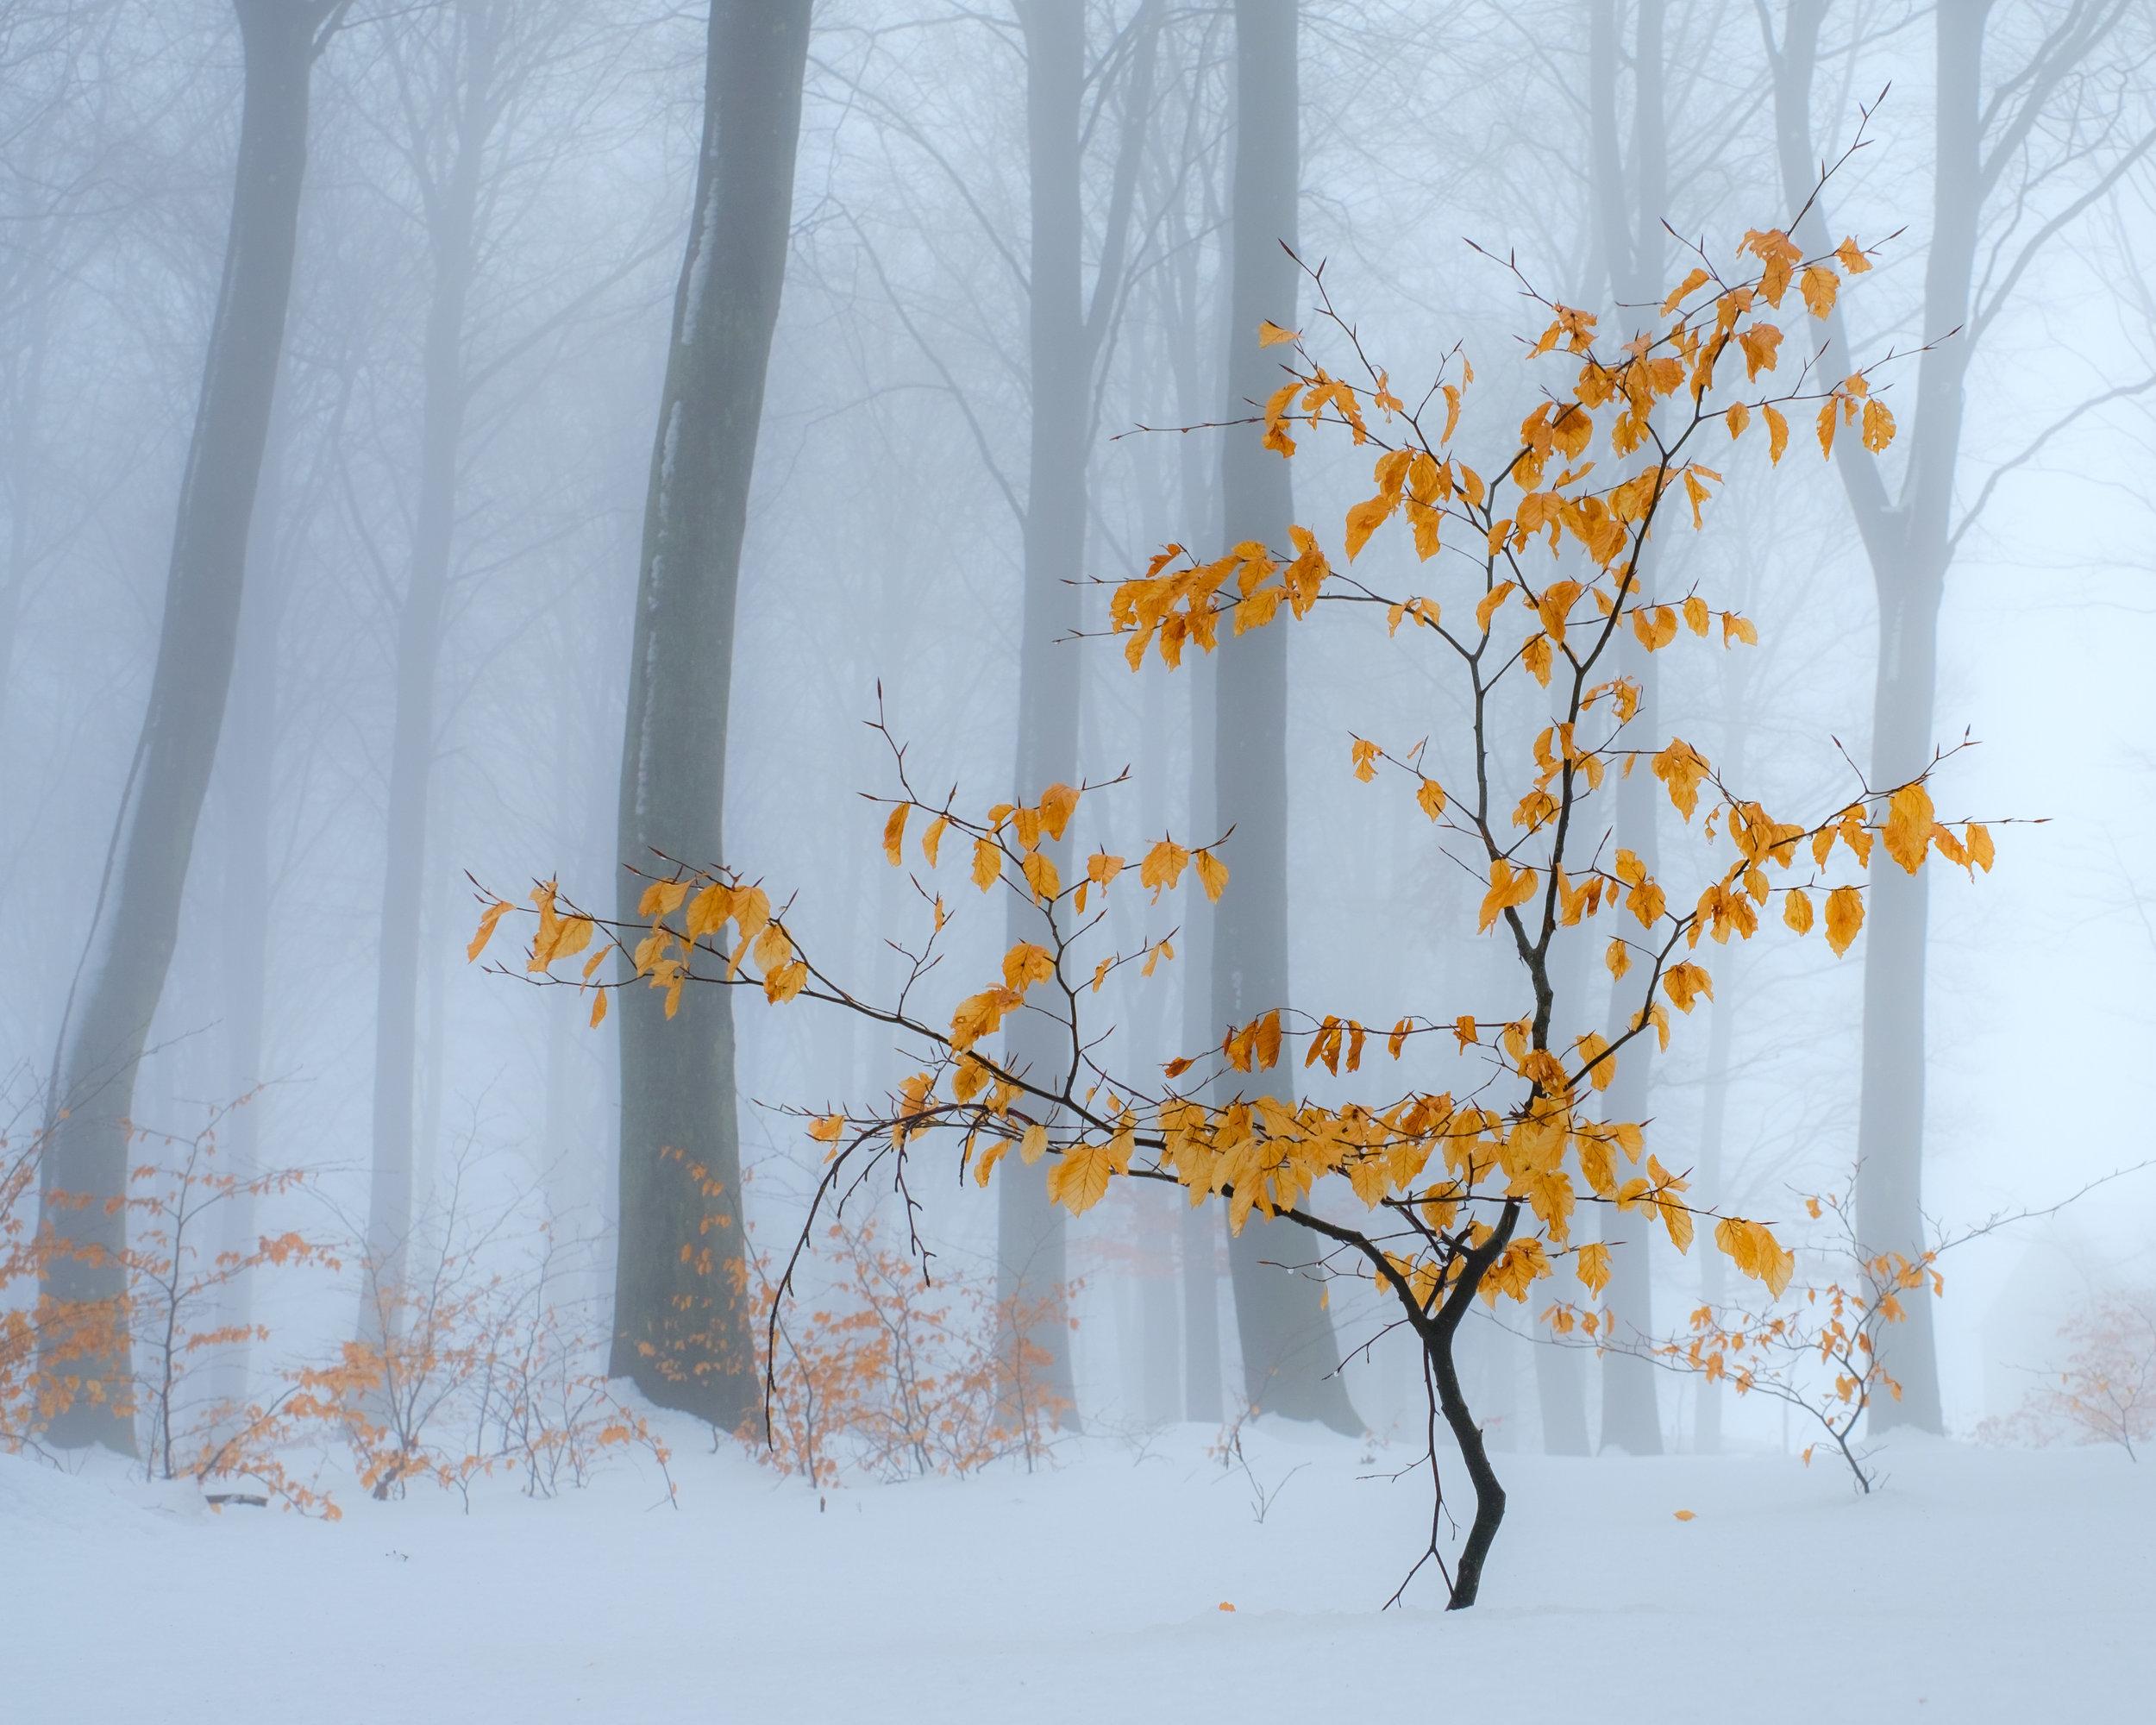 sankt olof tree coliur fog 4.jpg